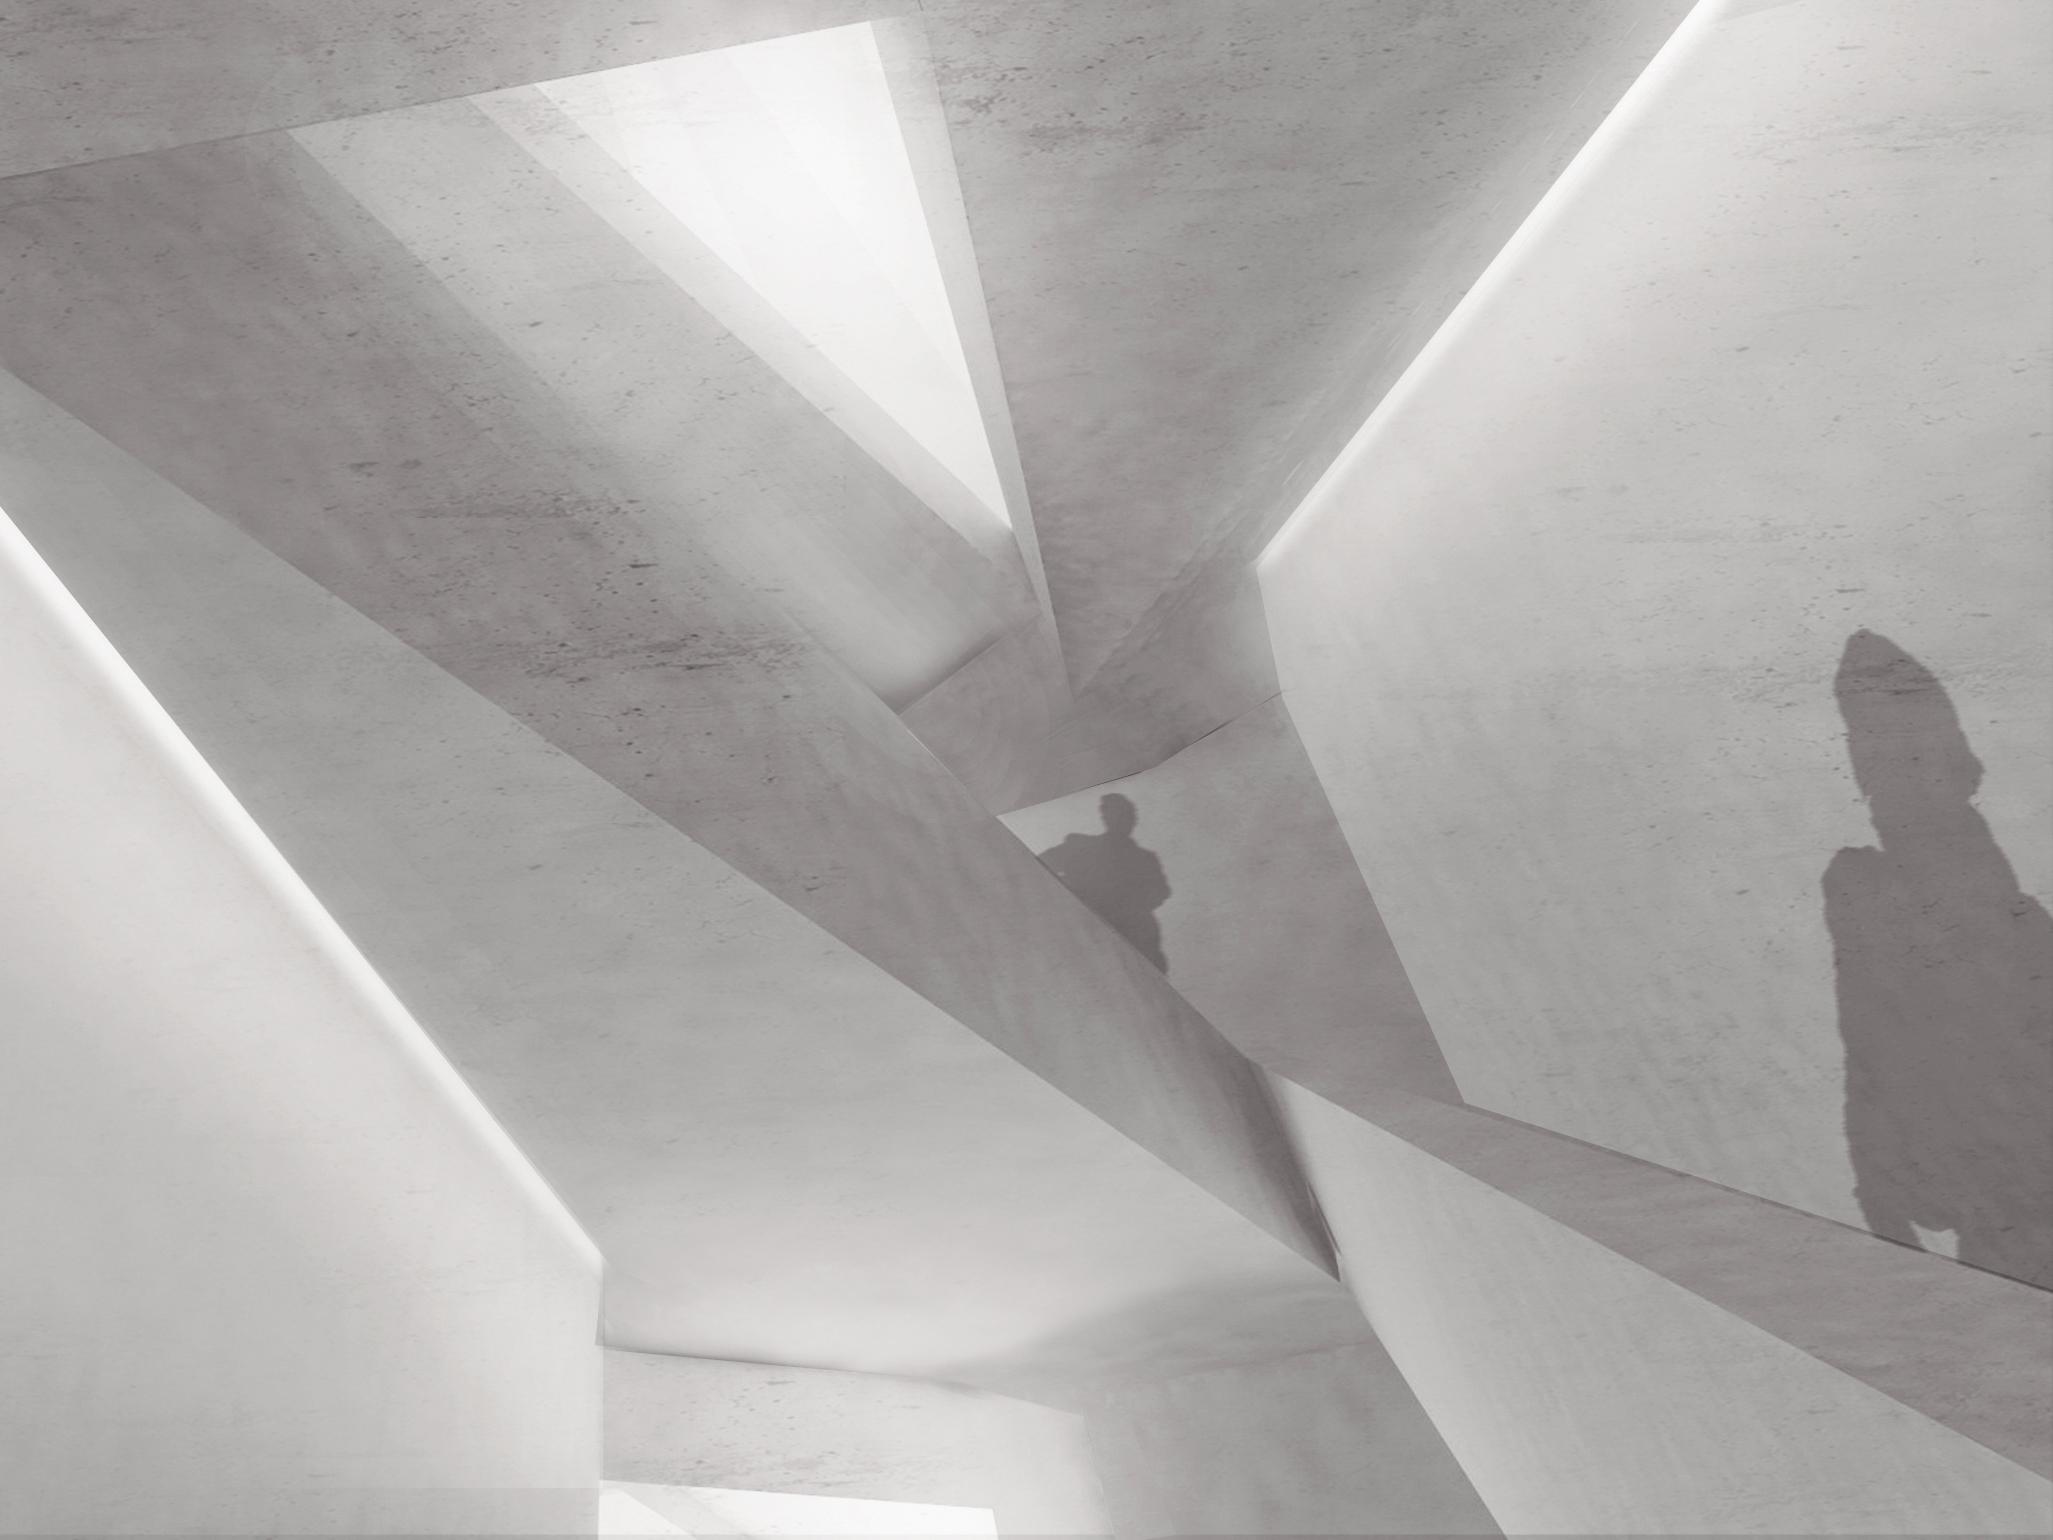 Michael-Becker-Architects-Architekten-Gipfelstation-Nebelhorn-Perspektive-K04